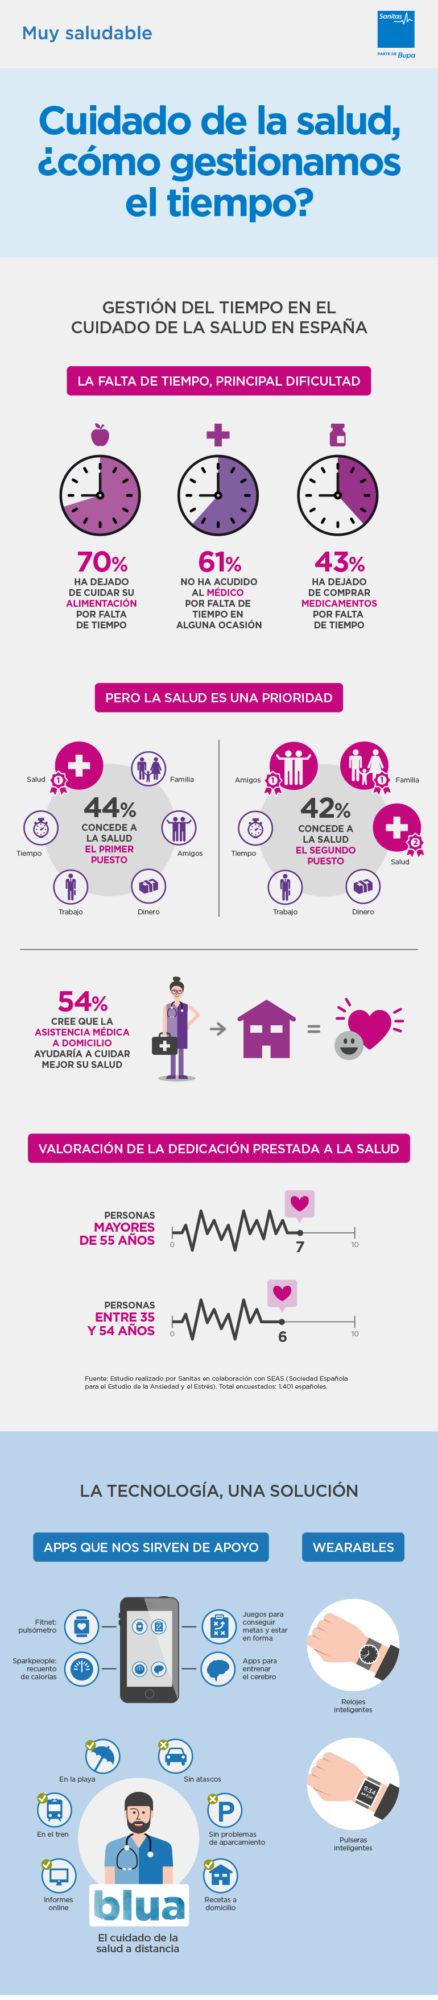 telemedicina-digitalizacion-salud-sanitas